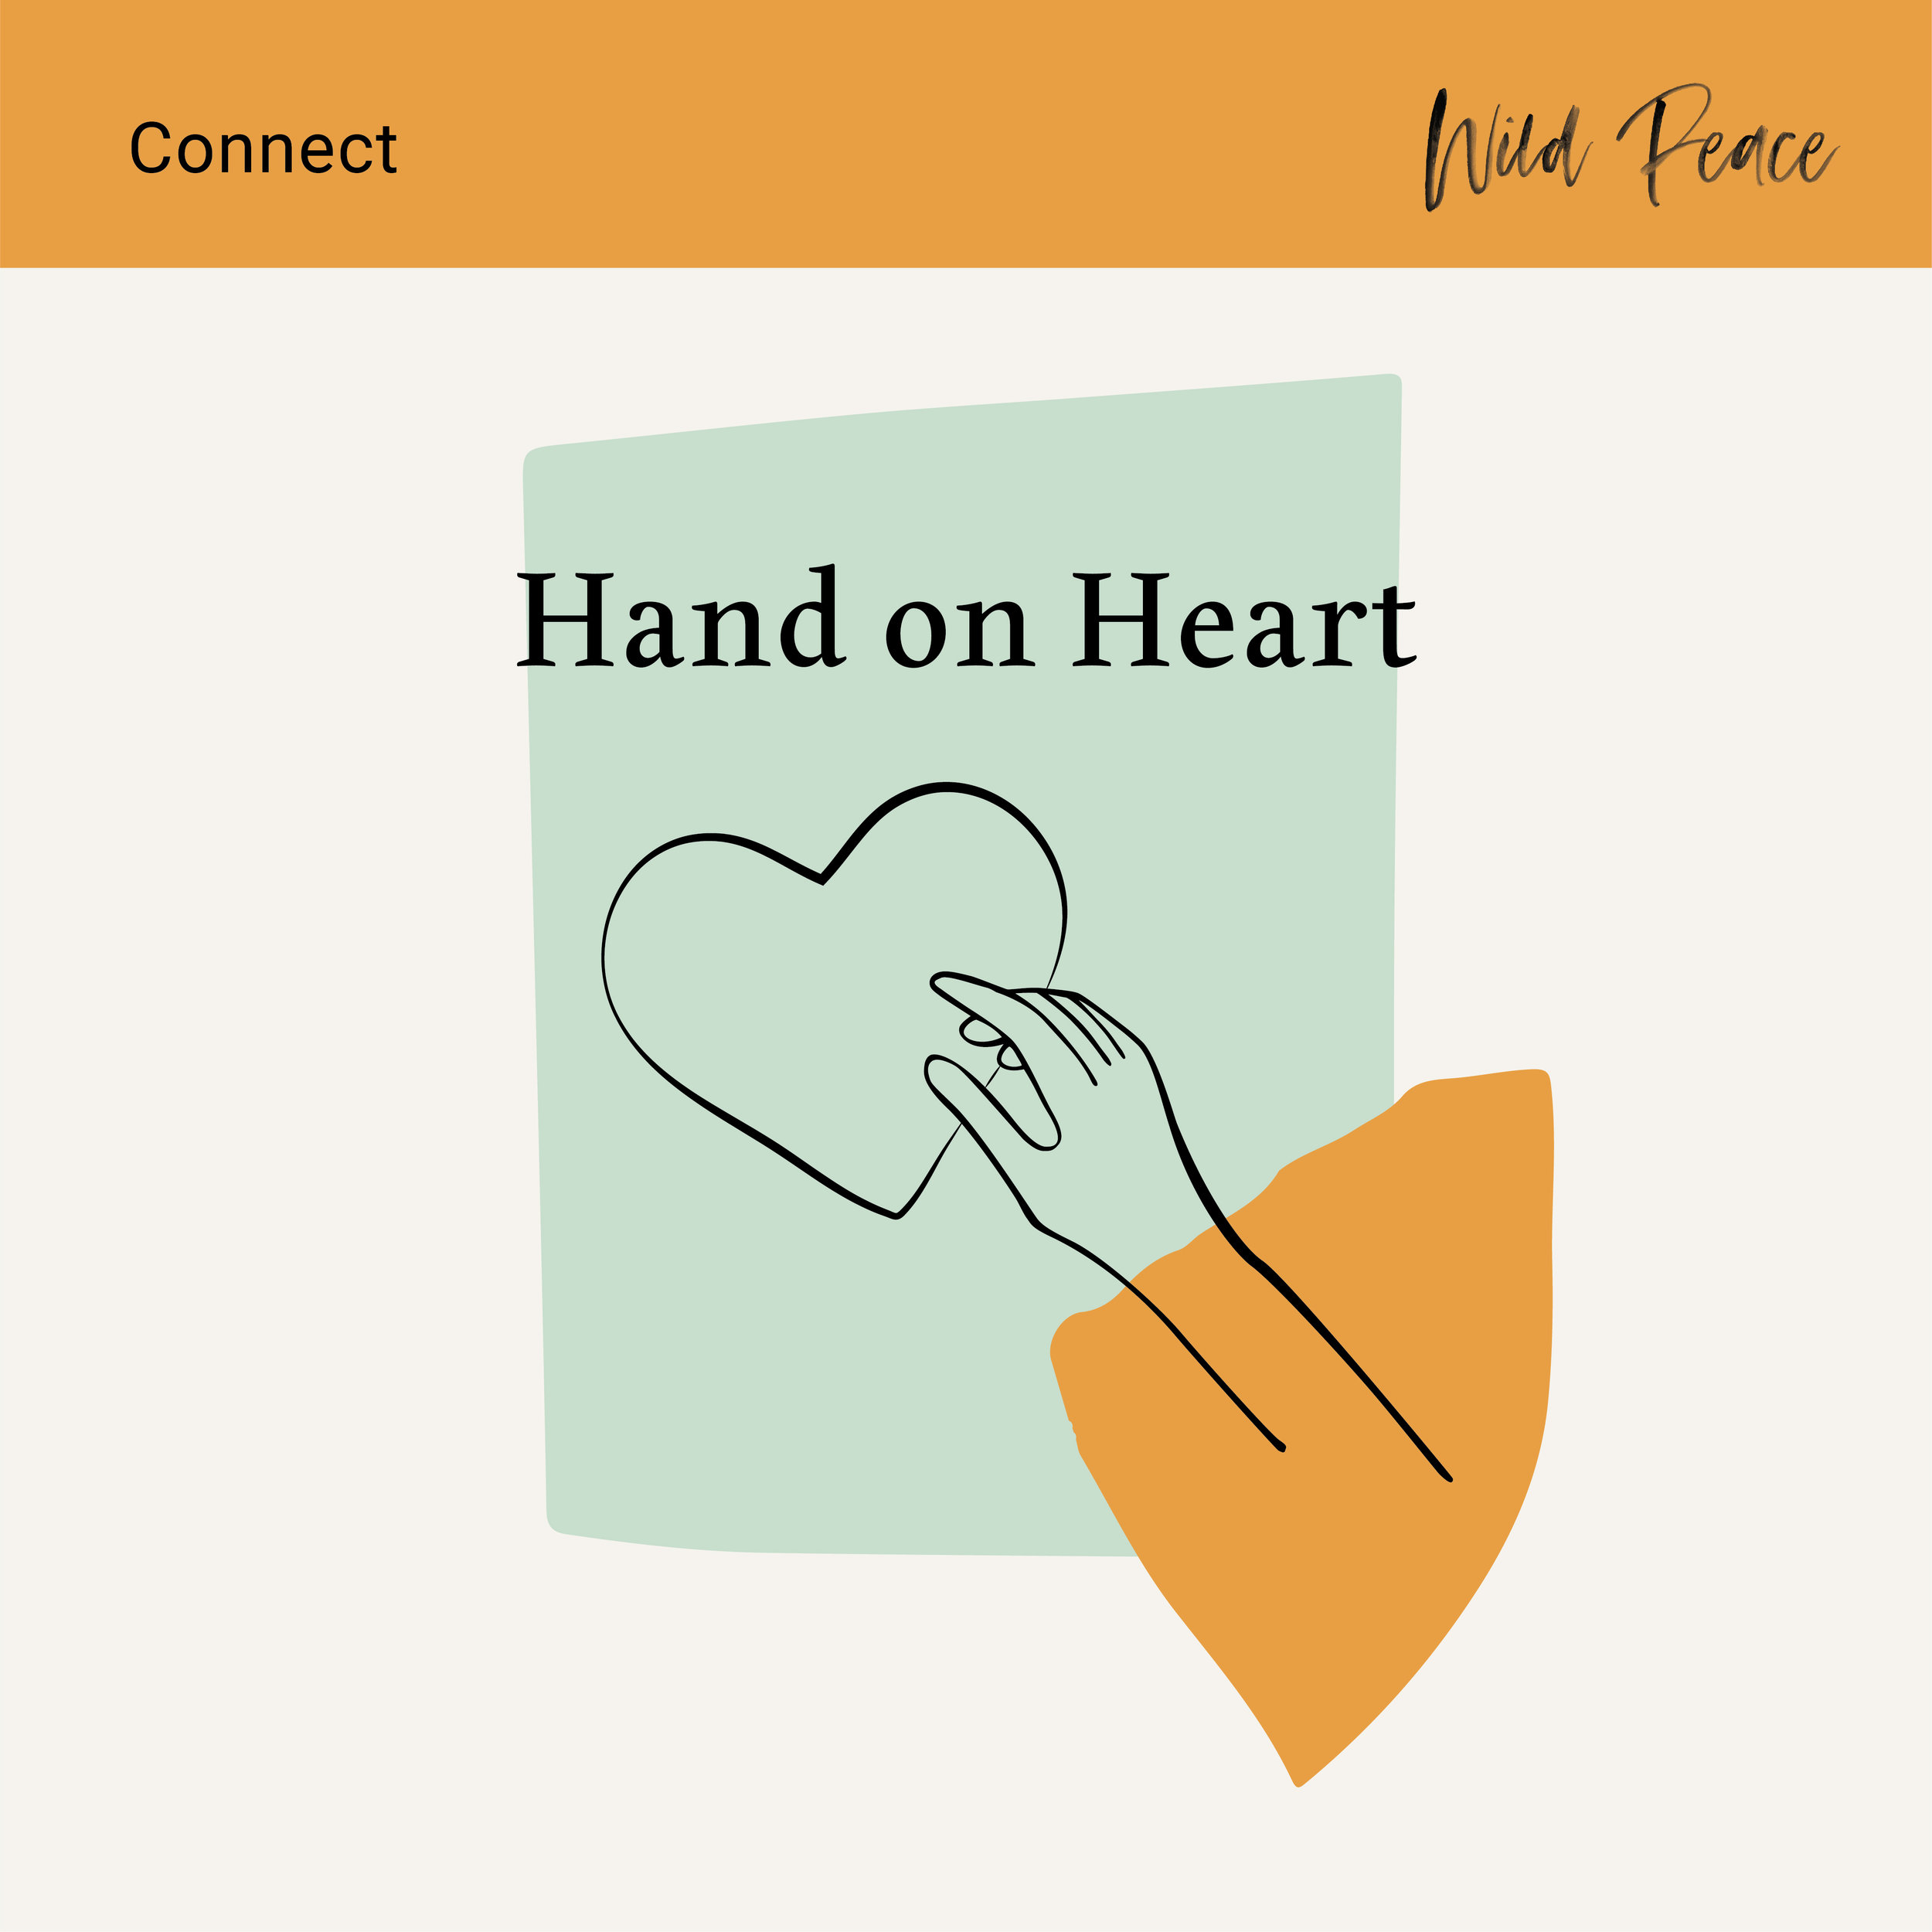 handonheart_reach out 1 copy.jpg